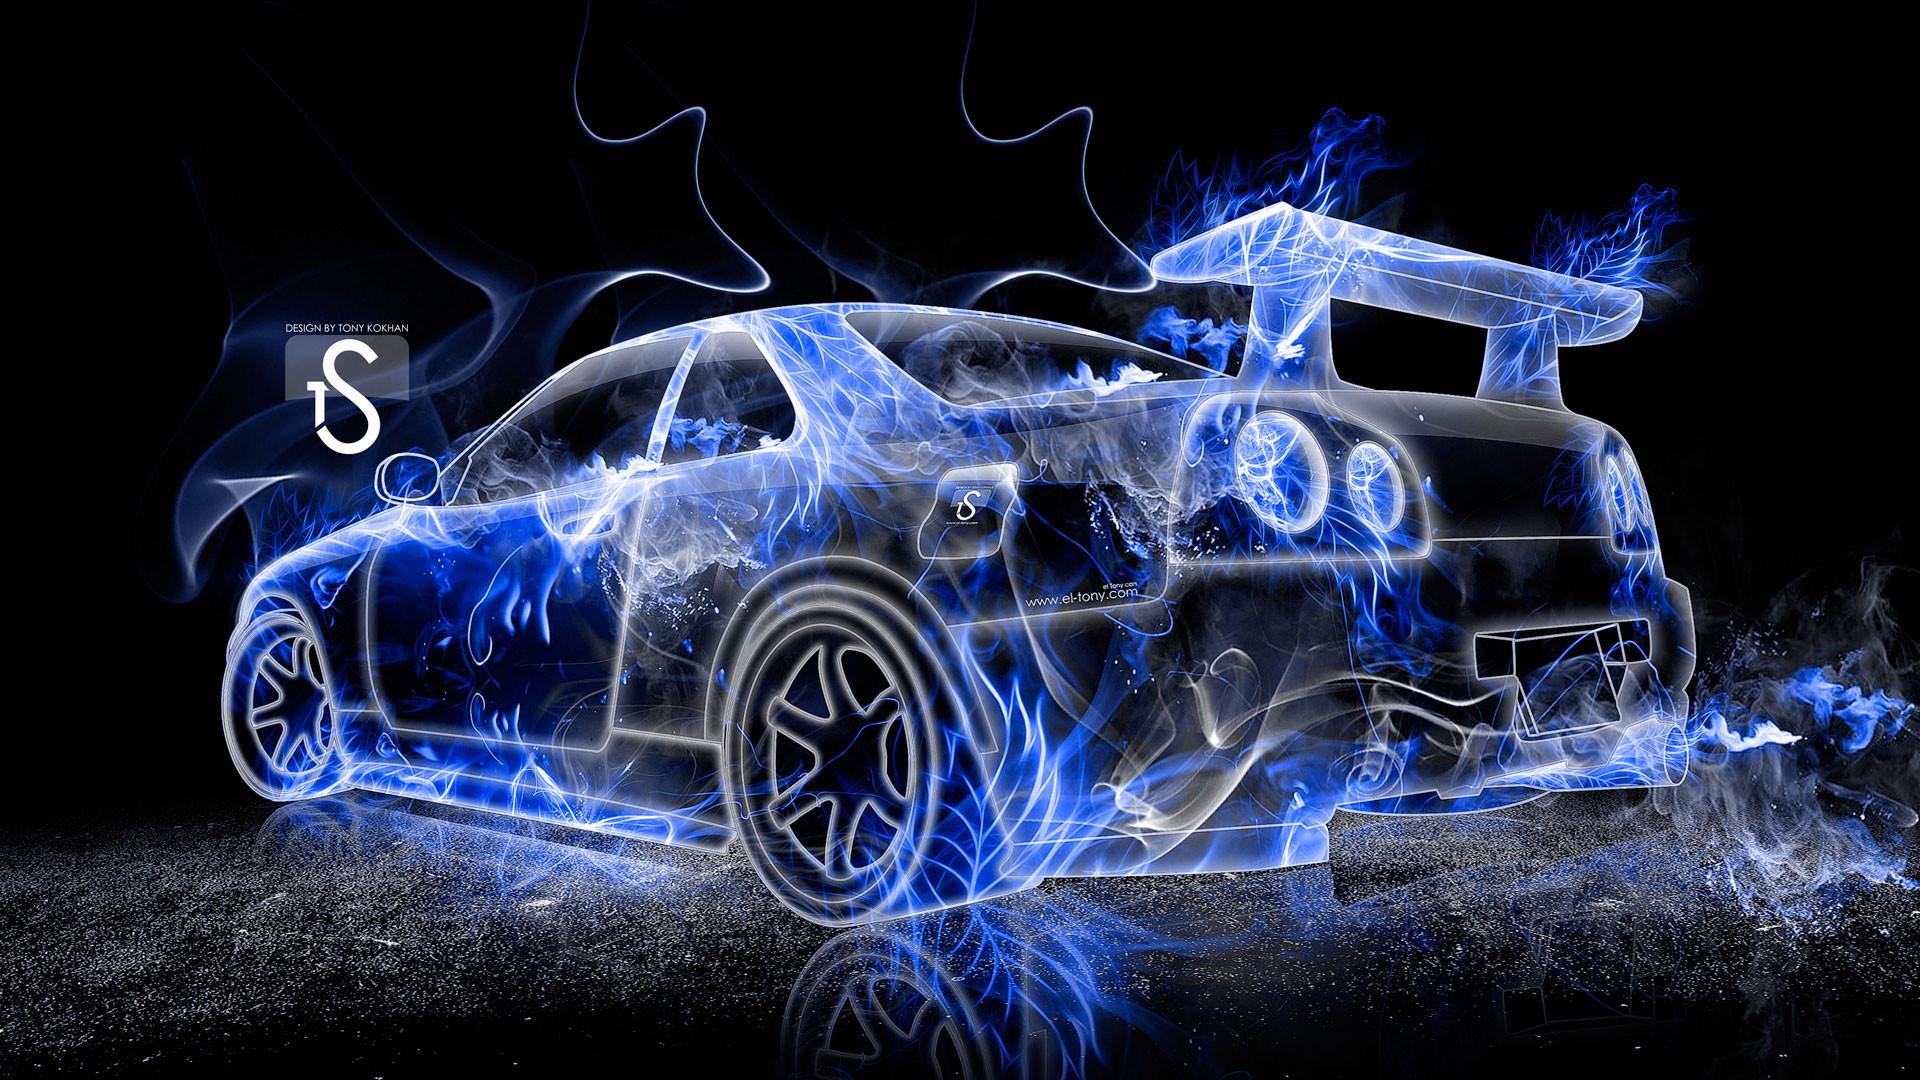 hd pics photos cars blue fire abstract desktop background wallpaper